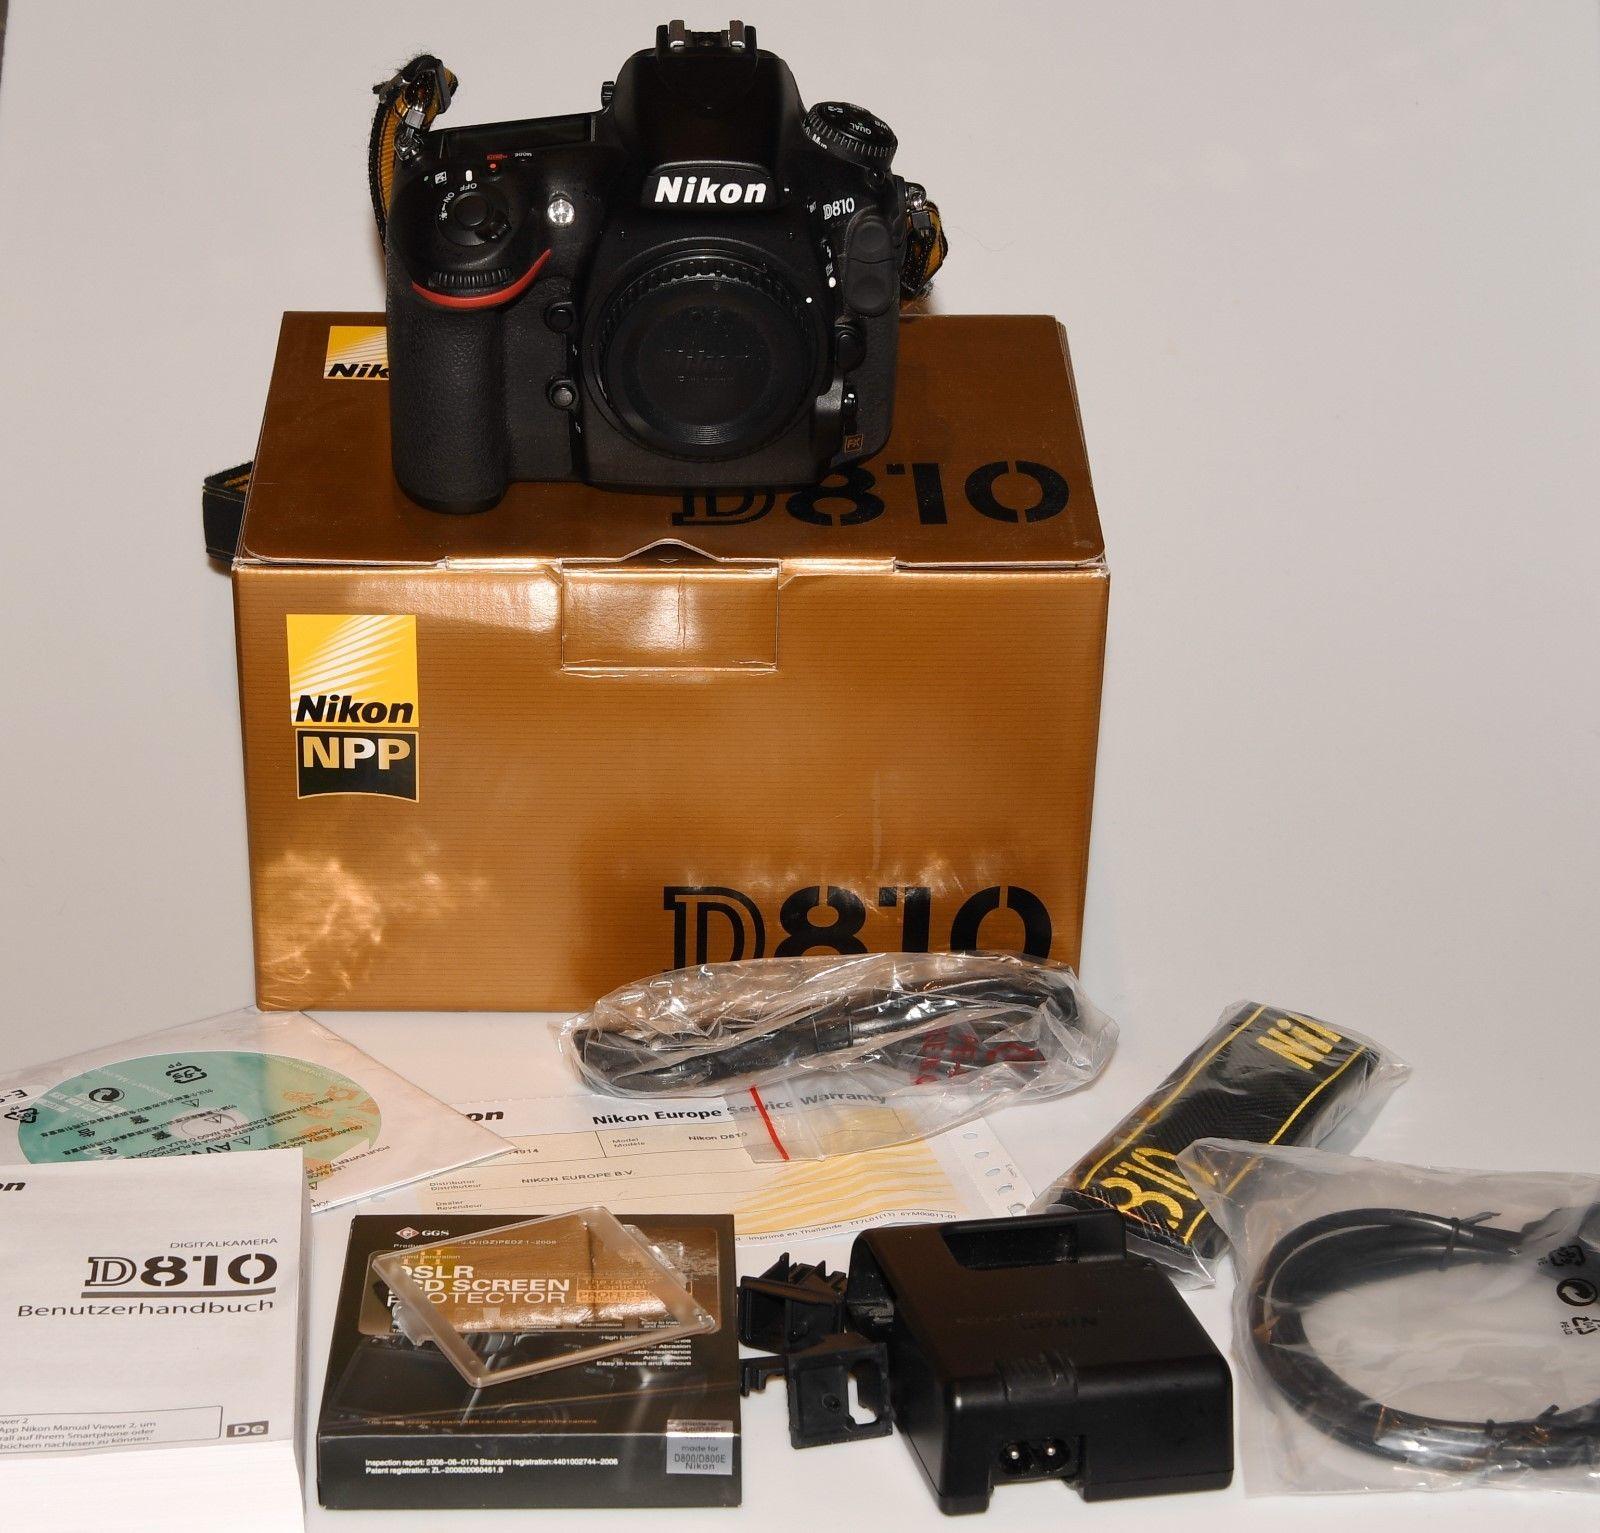 Nikon D D810 36.3MP Digitalkamera - Schwarz (Nur Gehäuse)